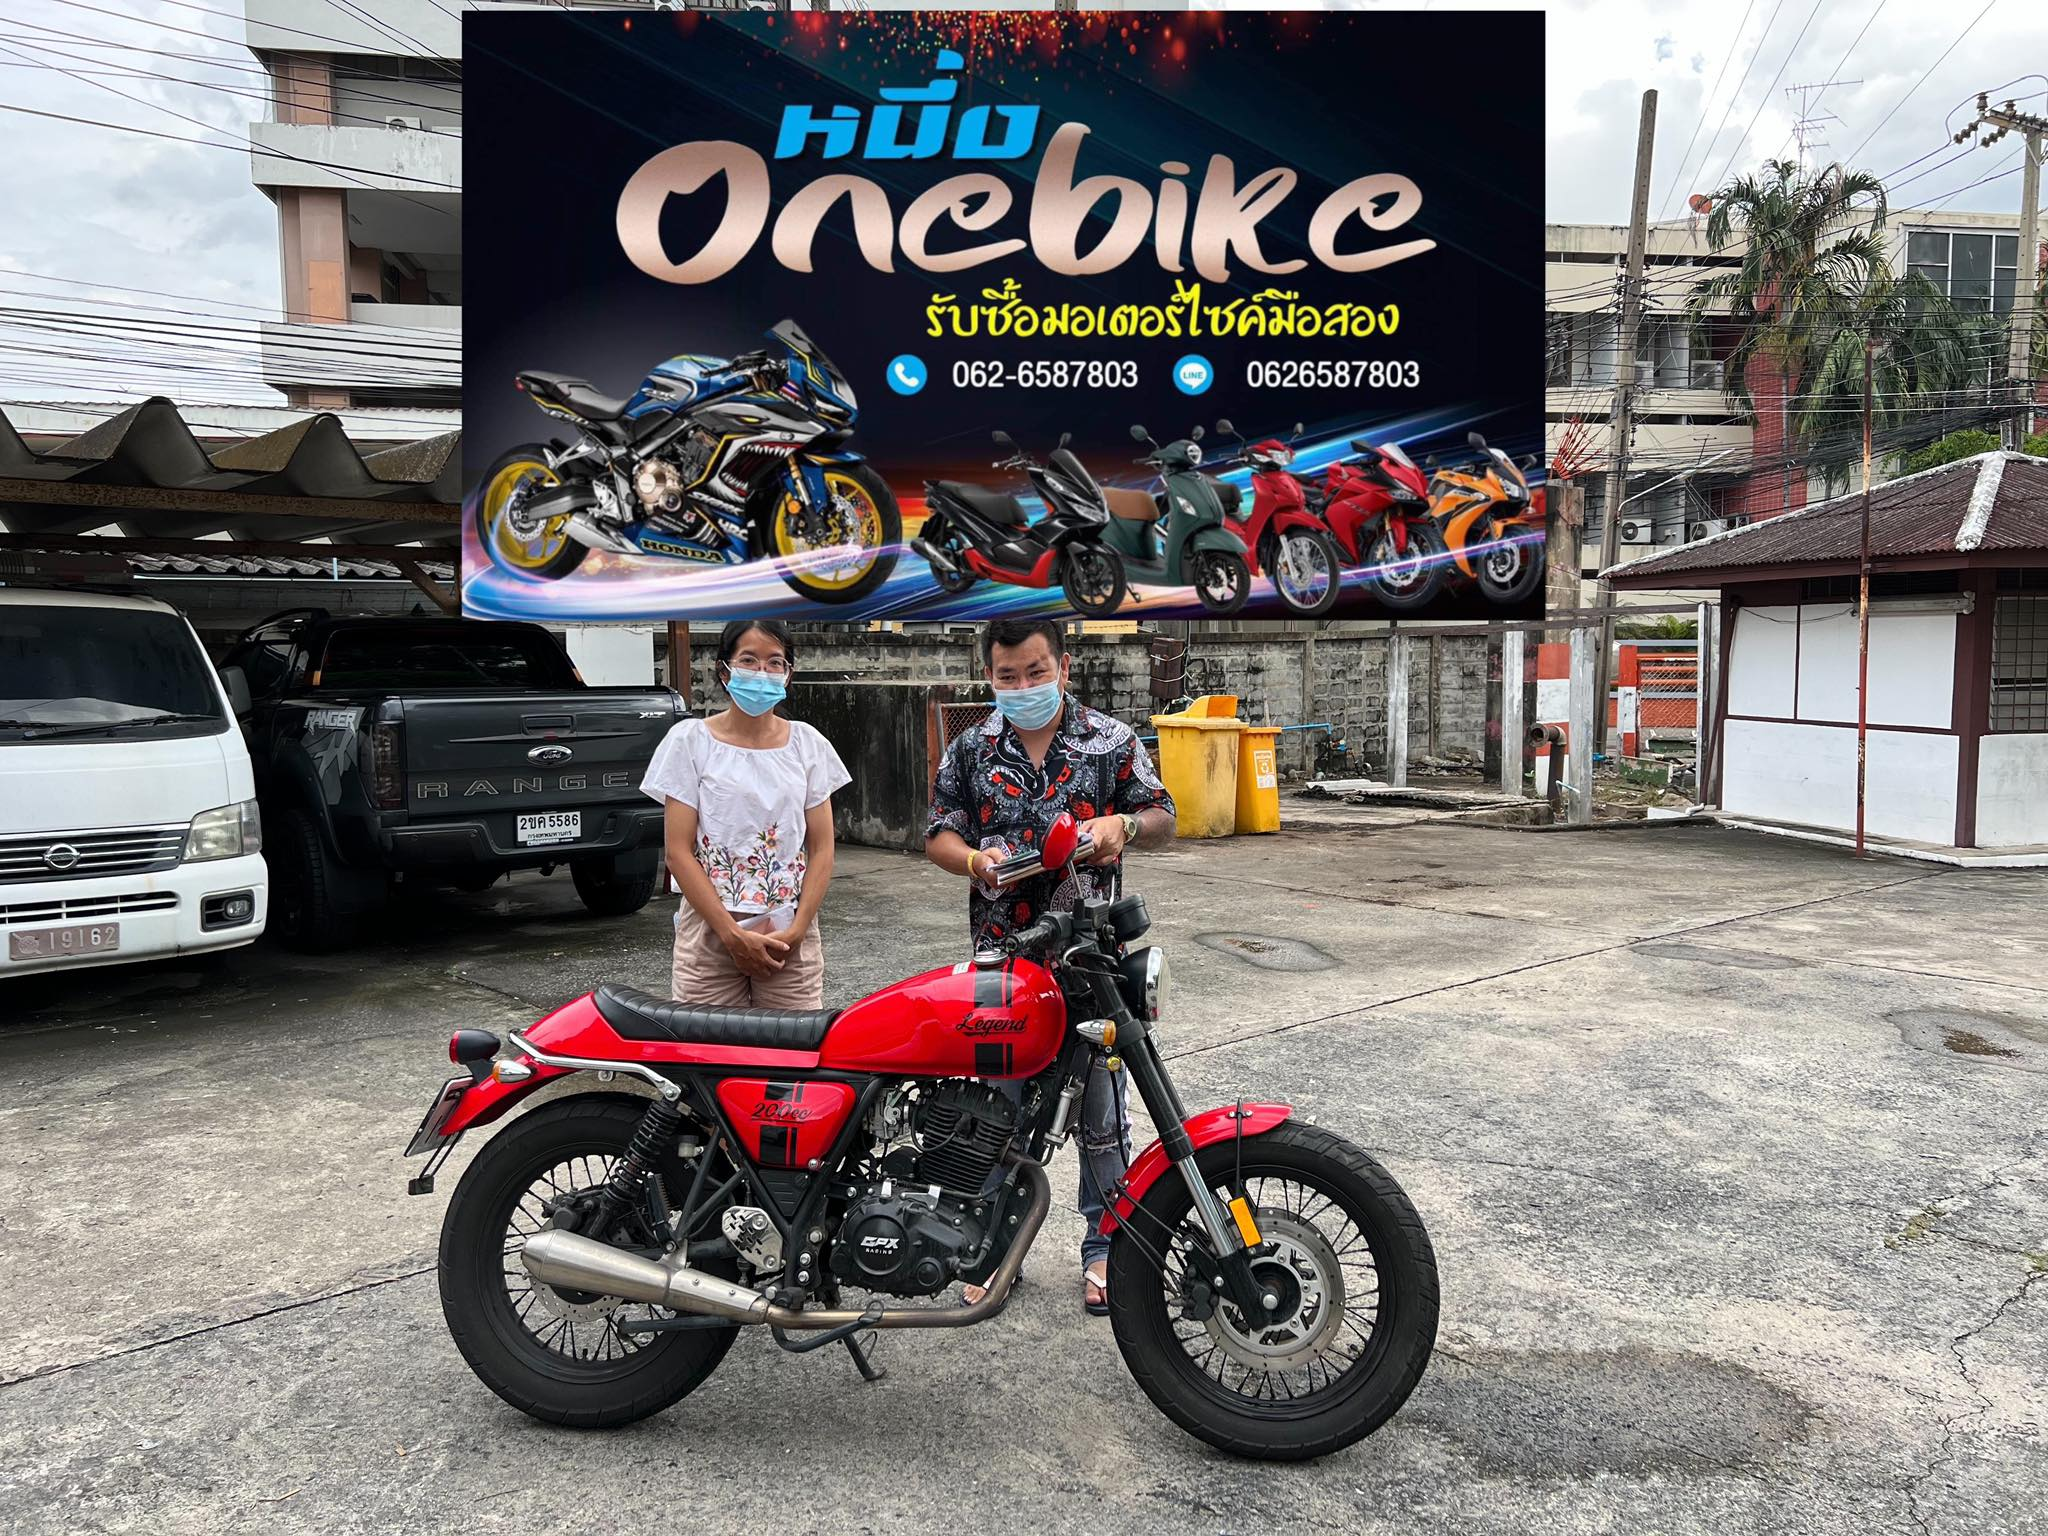 ONEBIKEรับซื้อมอเตอร์ไซค์นนทบุรี